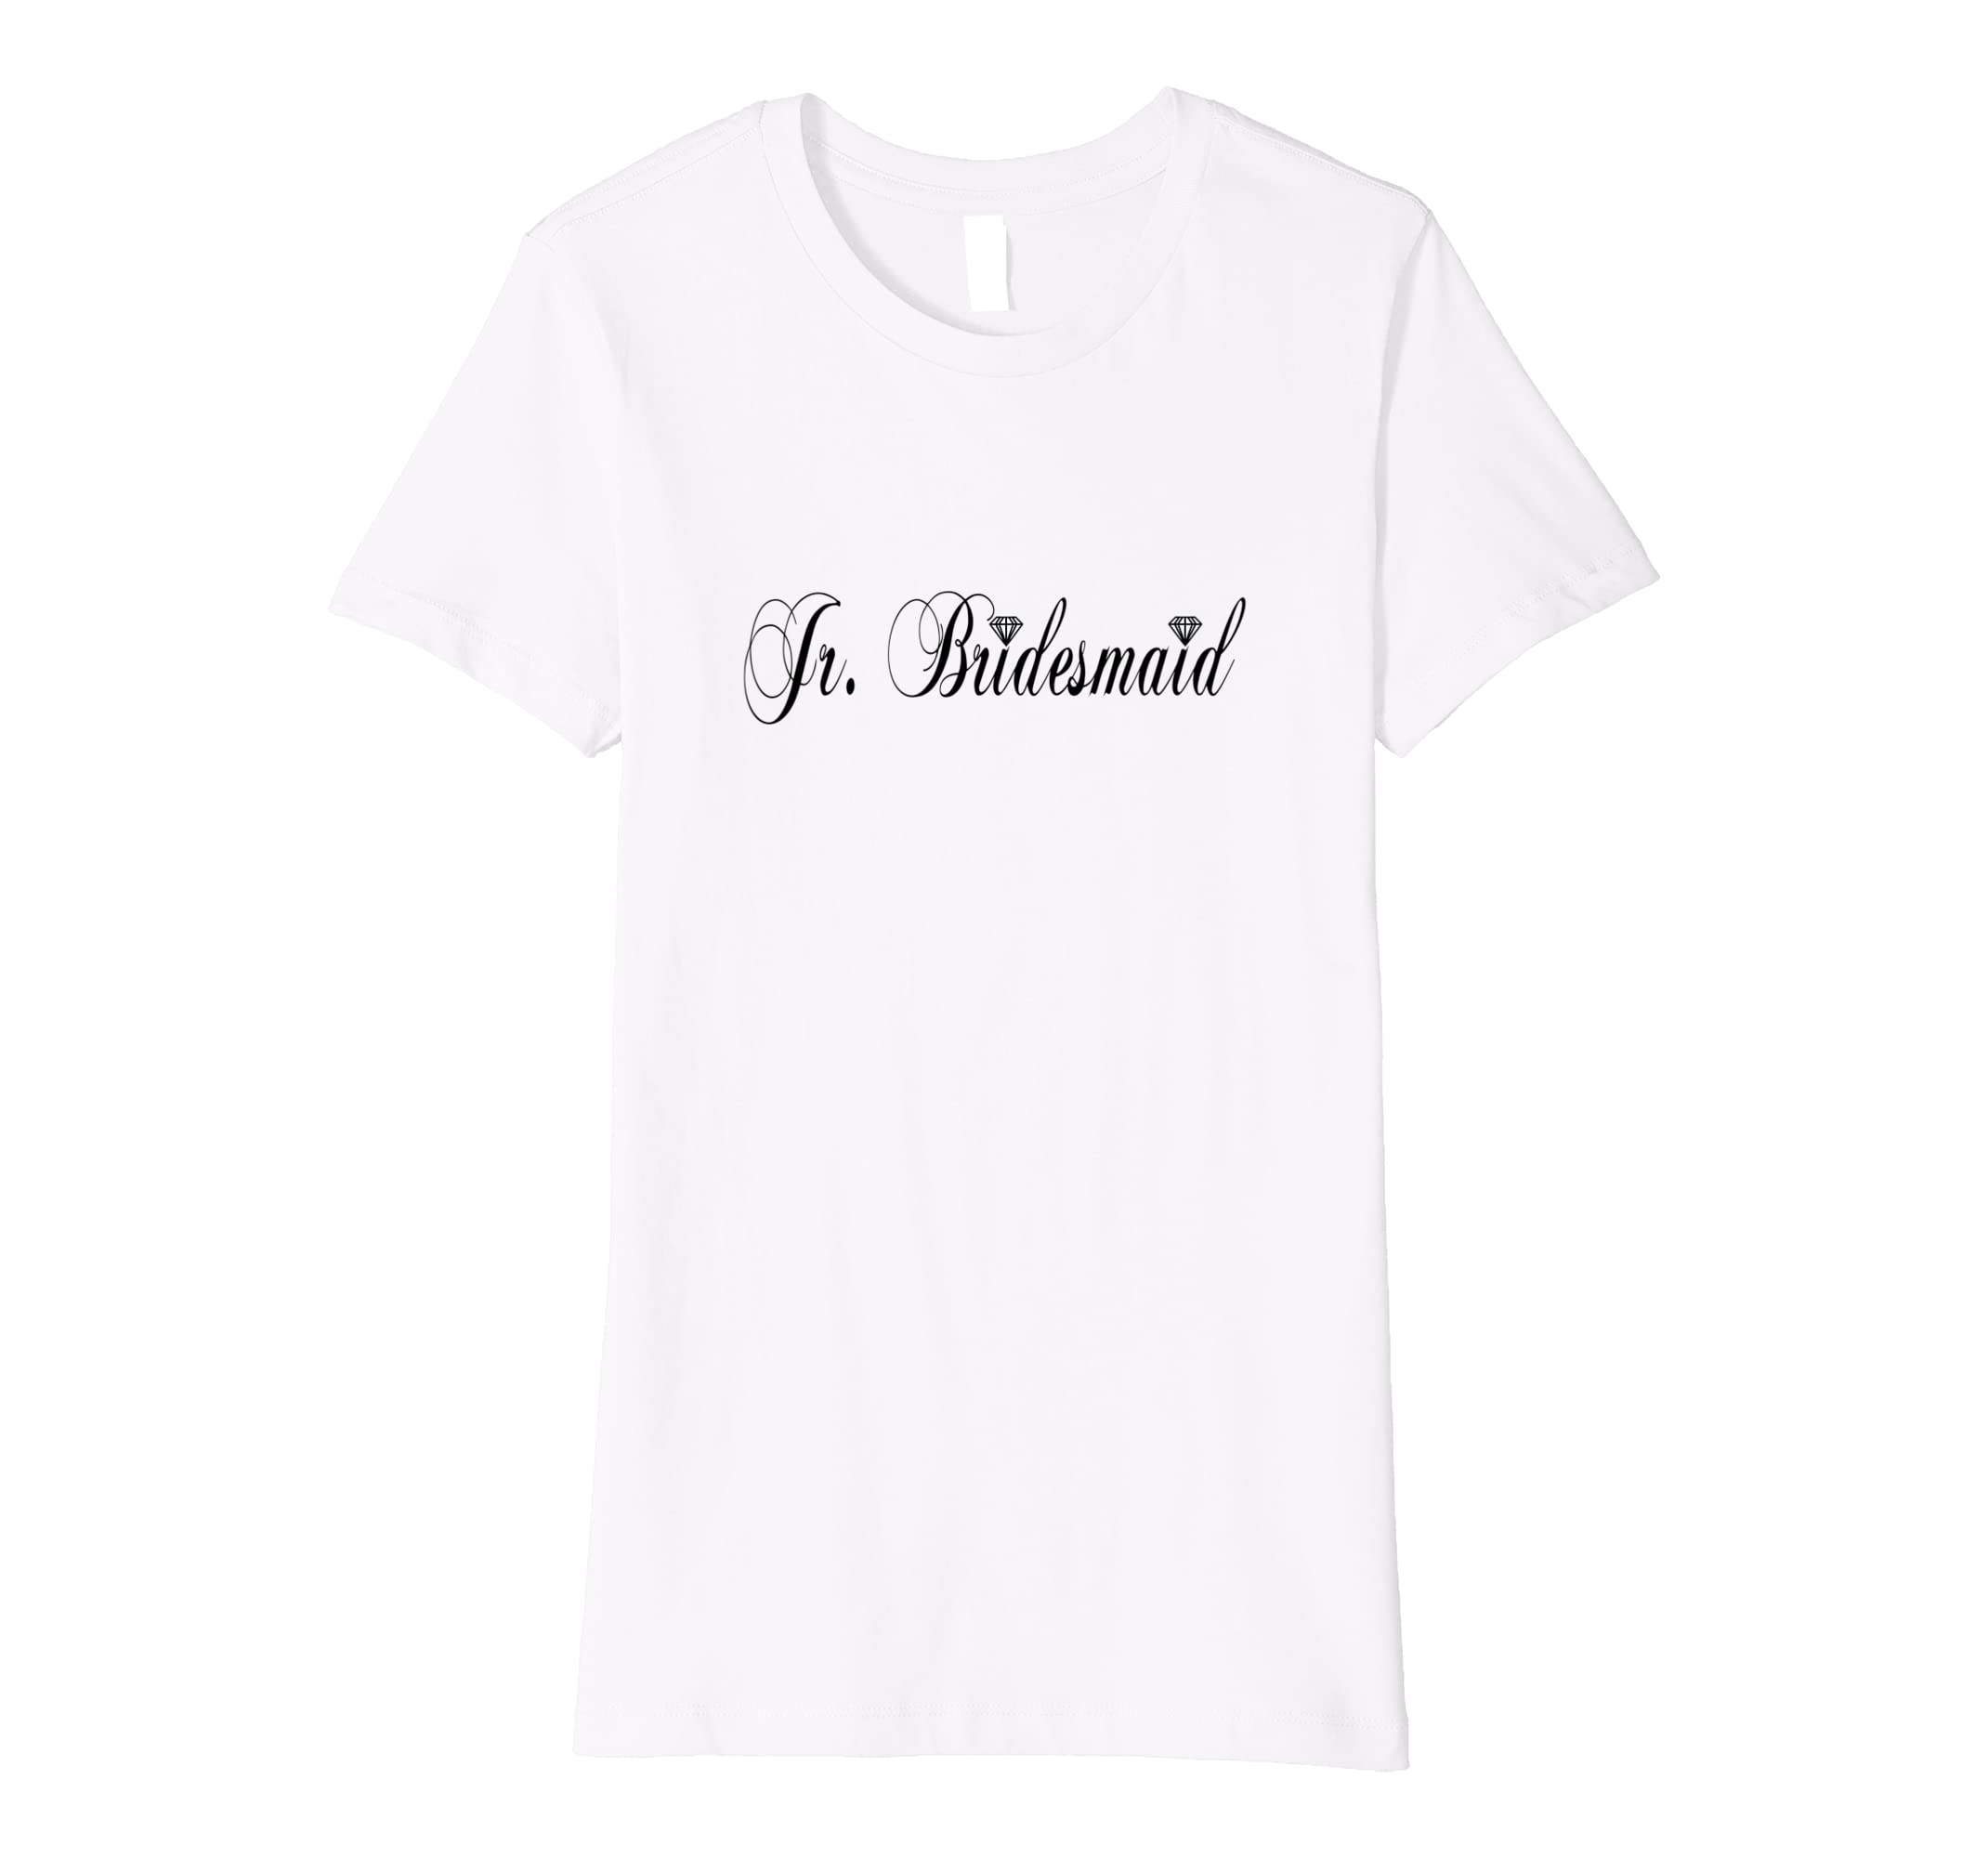 a7aefaf9f268c Junior Bridesmaid Diamond Wedding Bridal Party T-Shirt